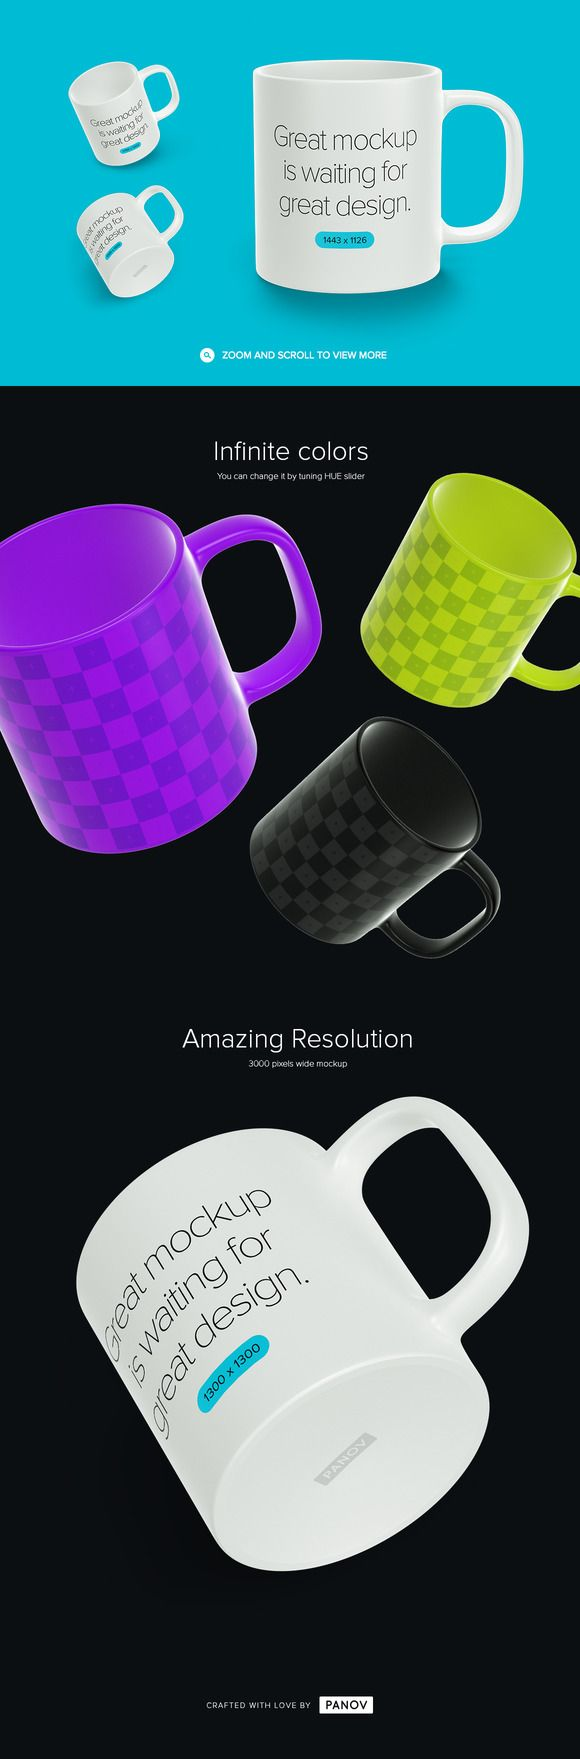 Coffee Mug Mockup by PANOV on @creativemarket